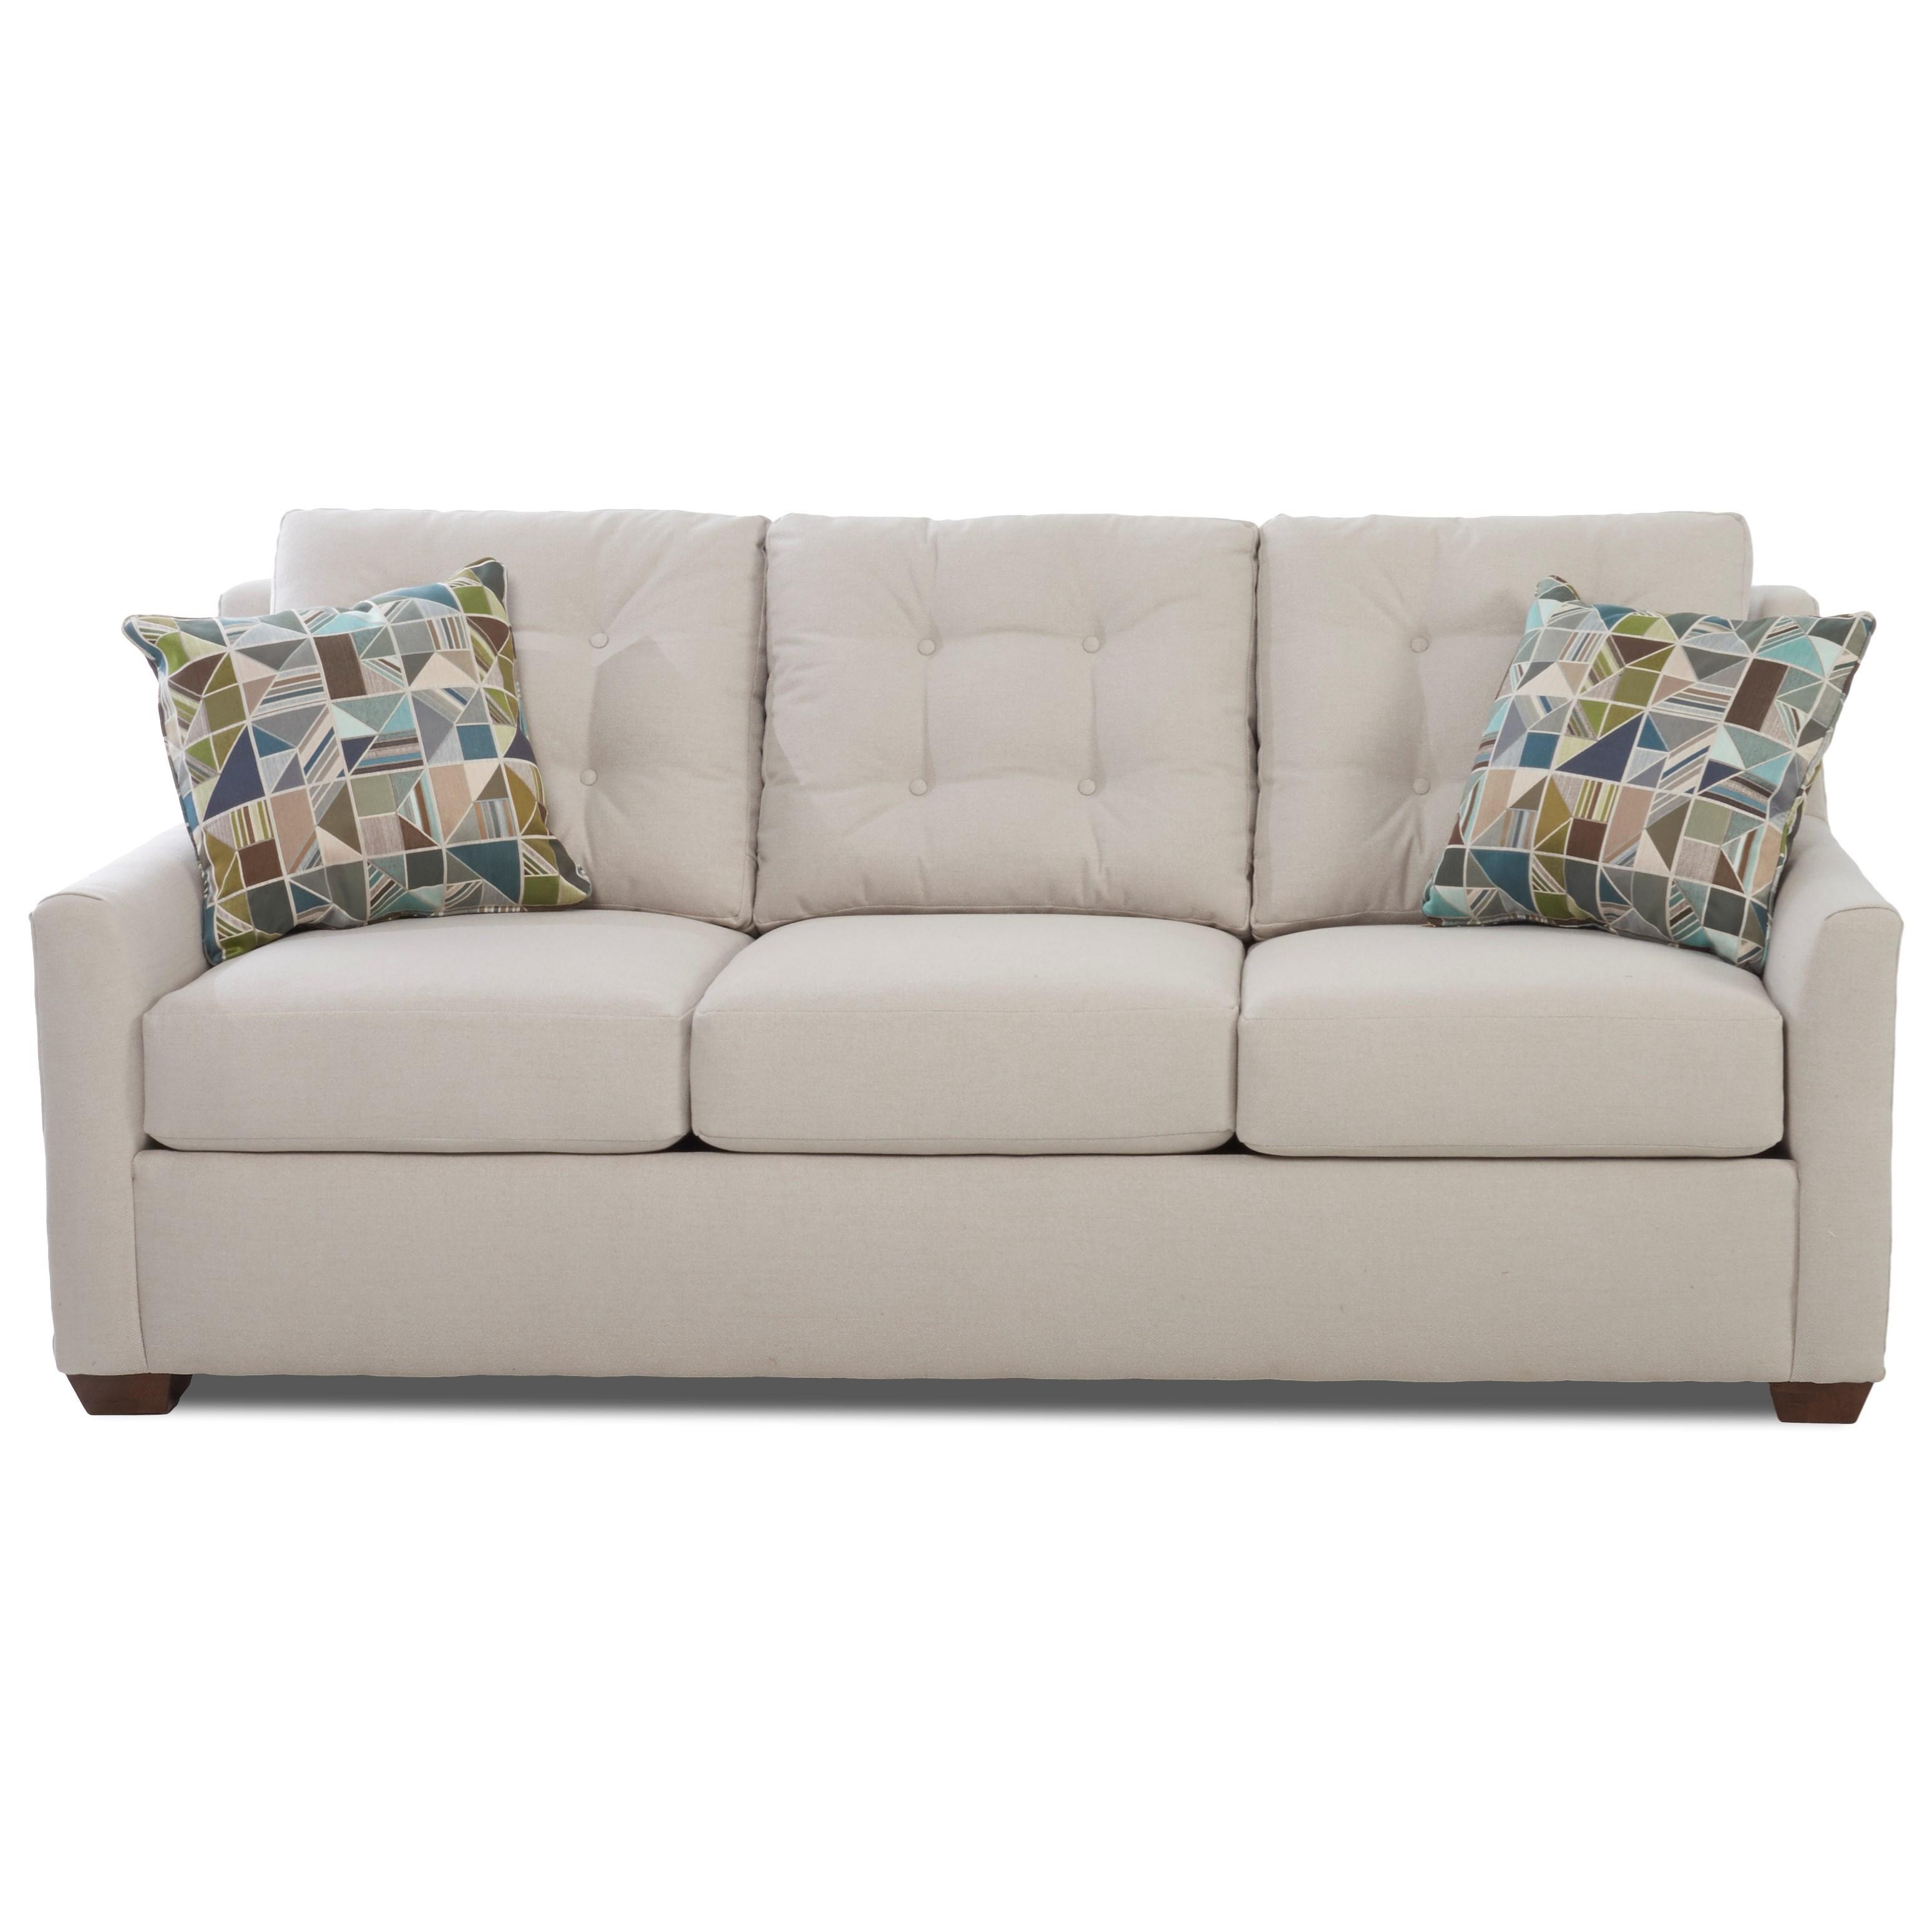 Klaussner GraytonQueen Enso Memory Foam Sleeper Sofa ...